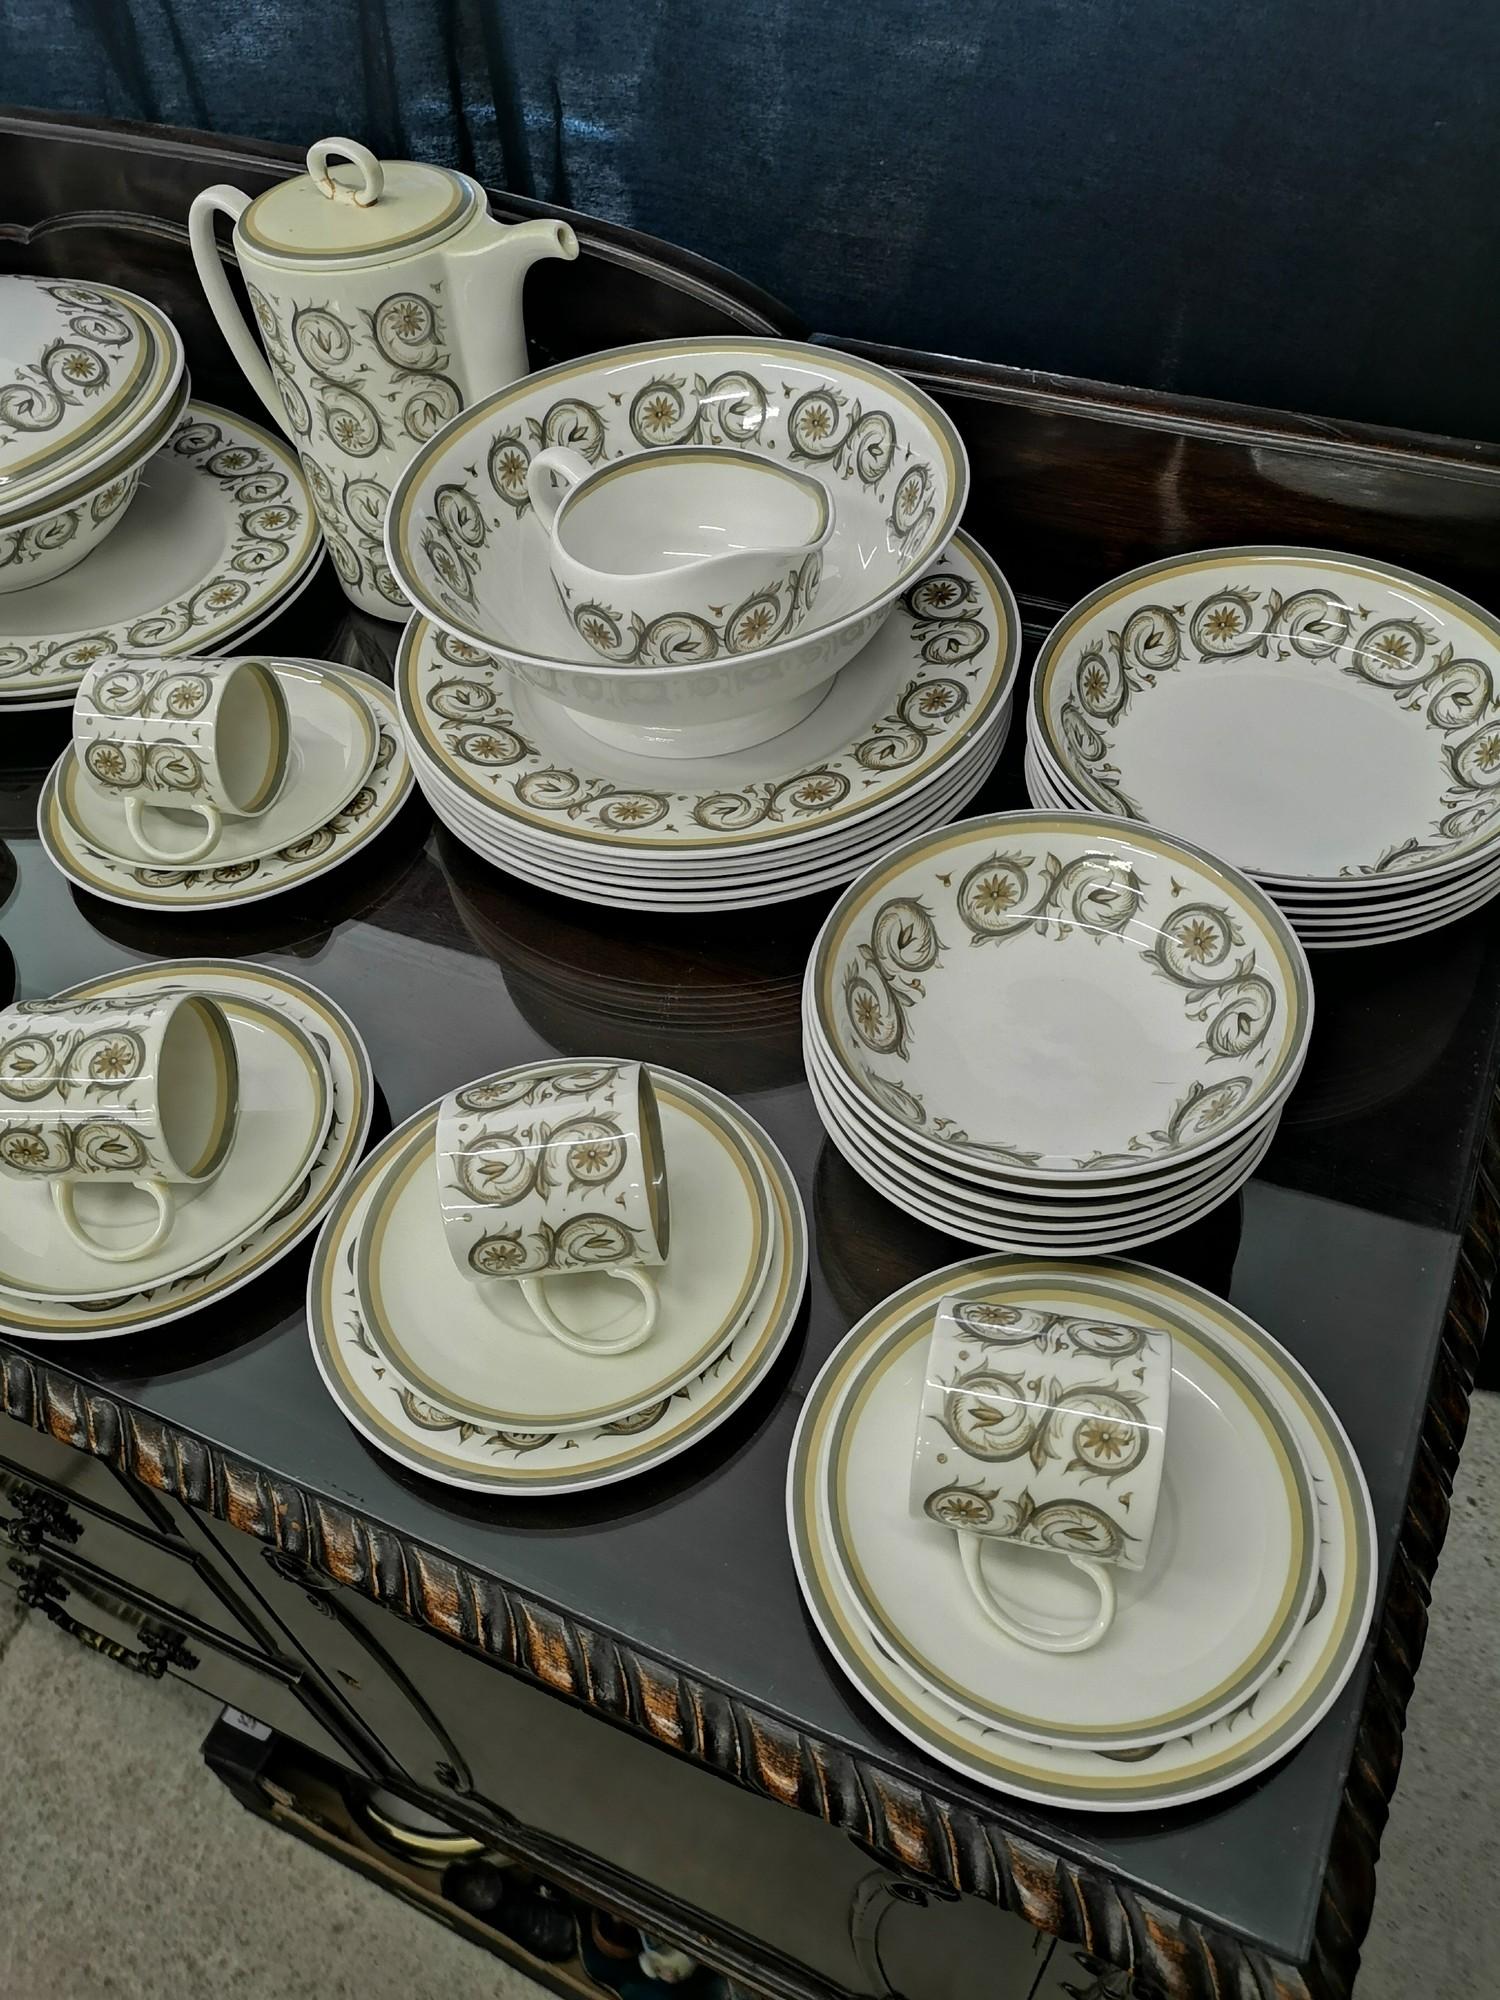 Large suzie Cooper retro venetia pattern tea & dinner service includes tureen tea pots etc. - Image 2 of 5